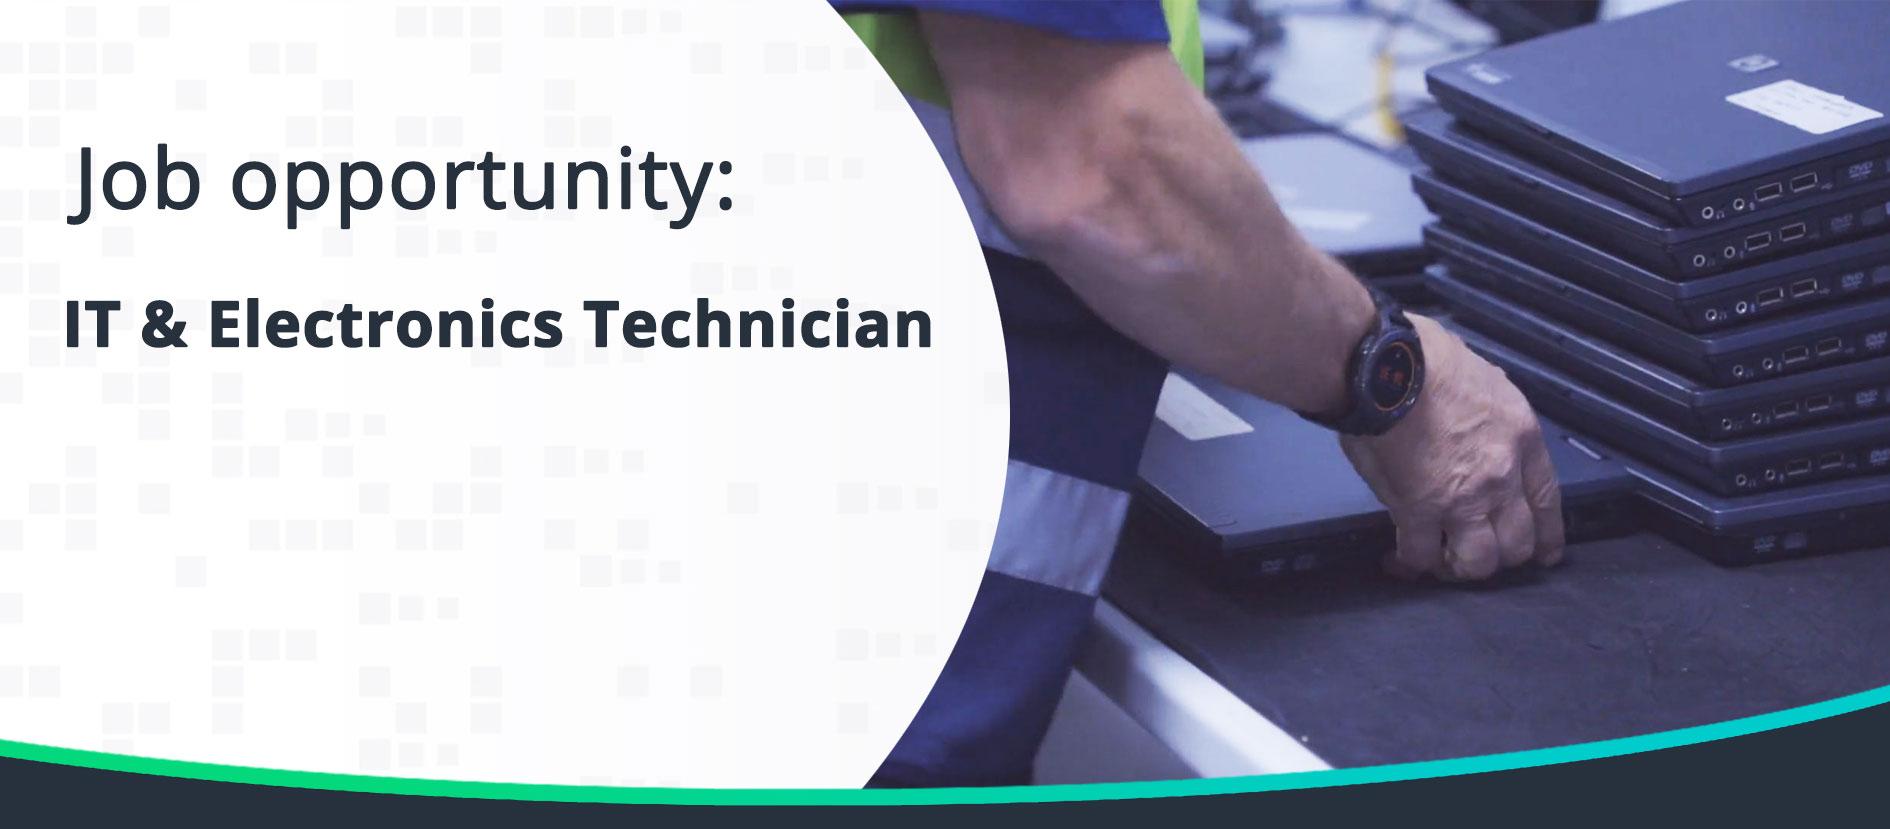 IT & Electronics Technician